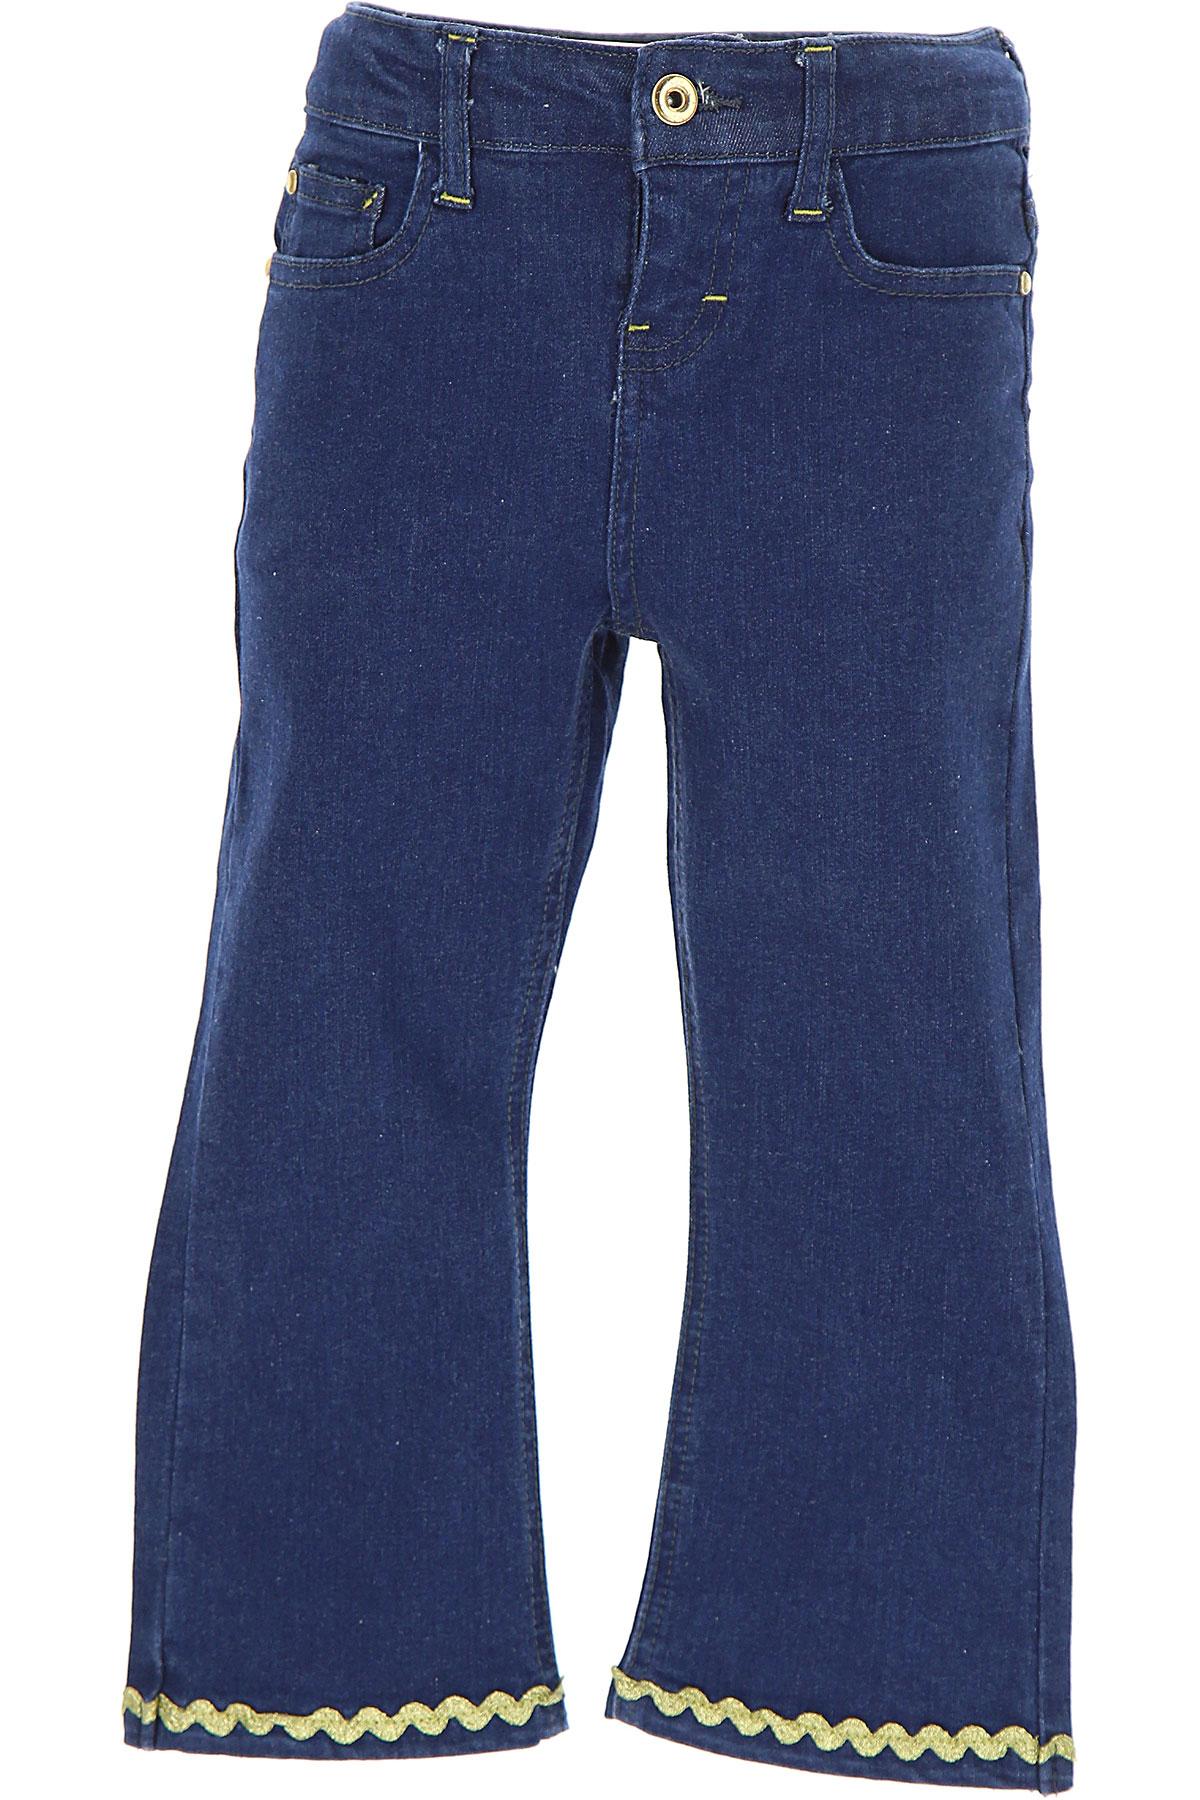 Image of Billieblush Kids Jeans for Girls, Blue Denim, Cotton, 2017, 4Y 6Y